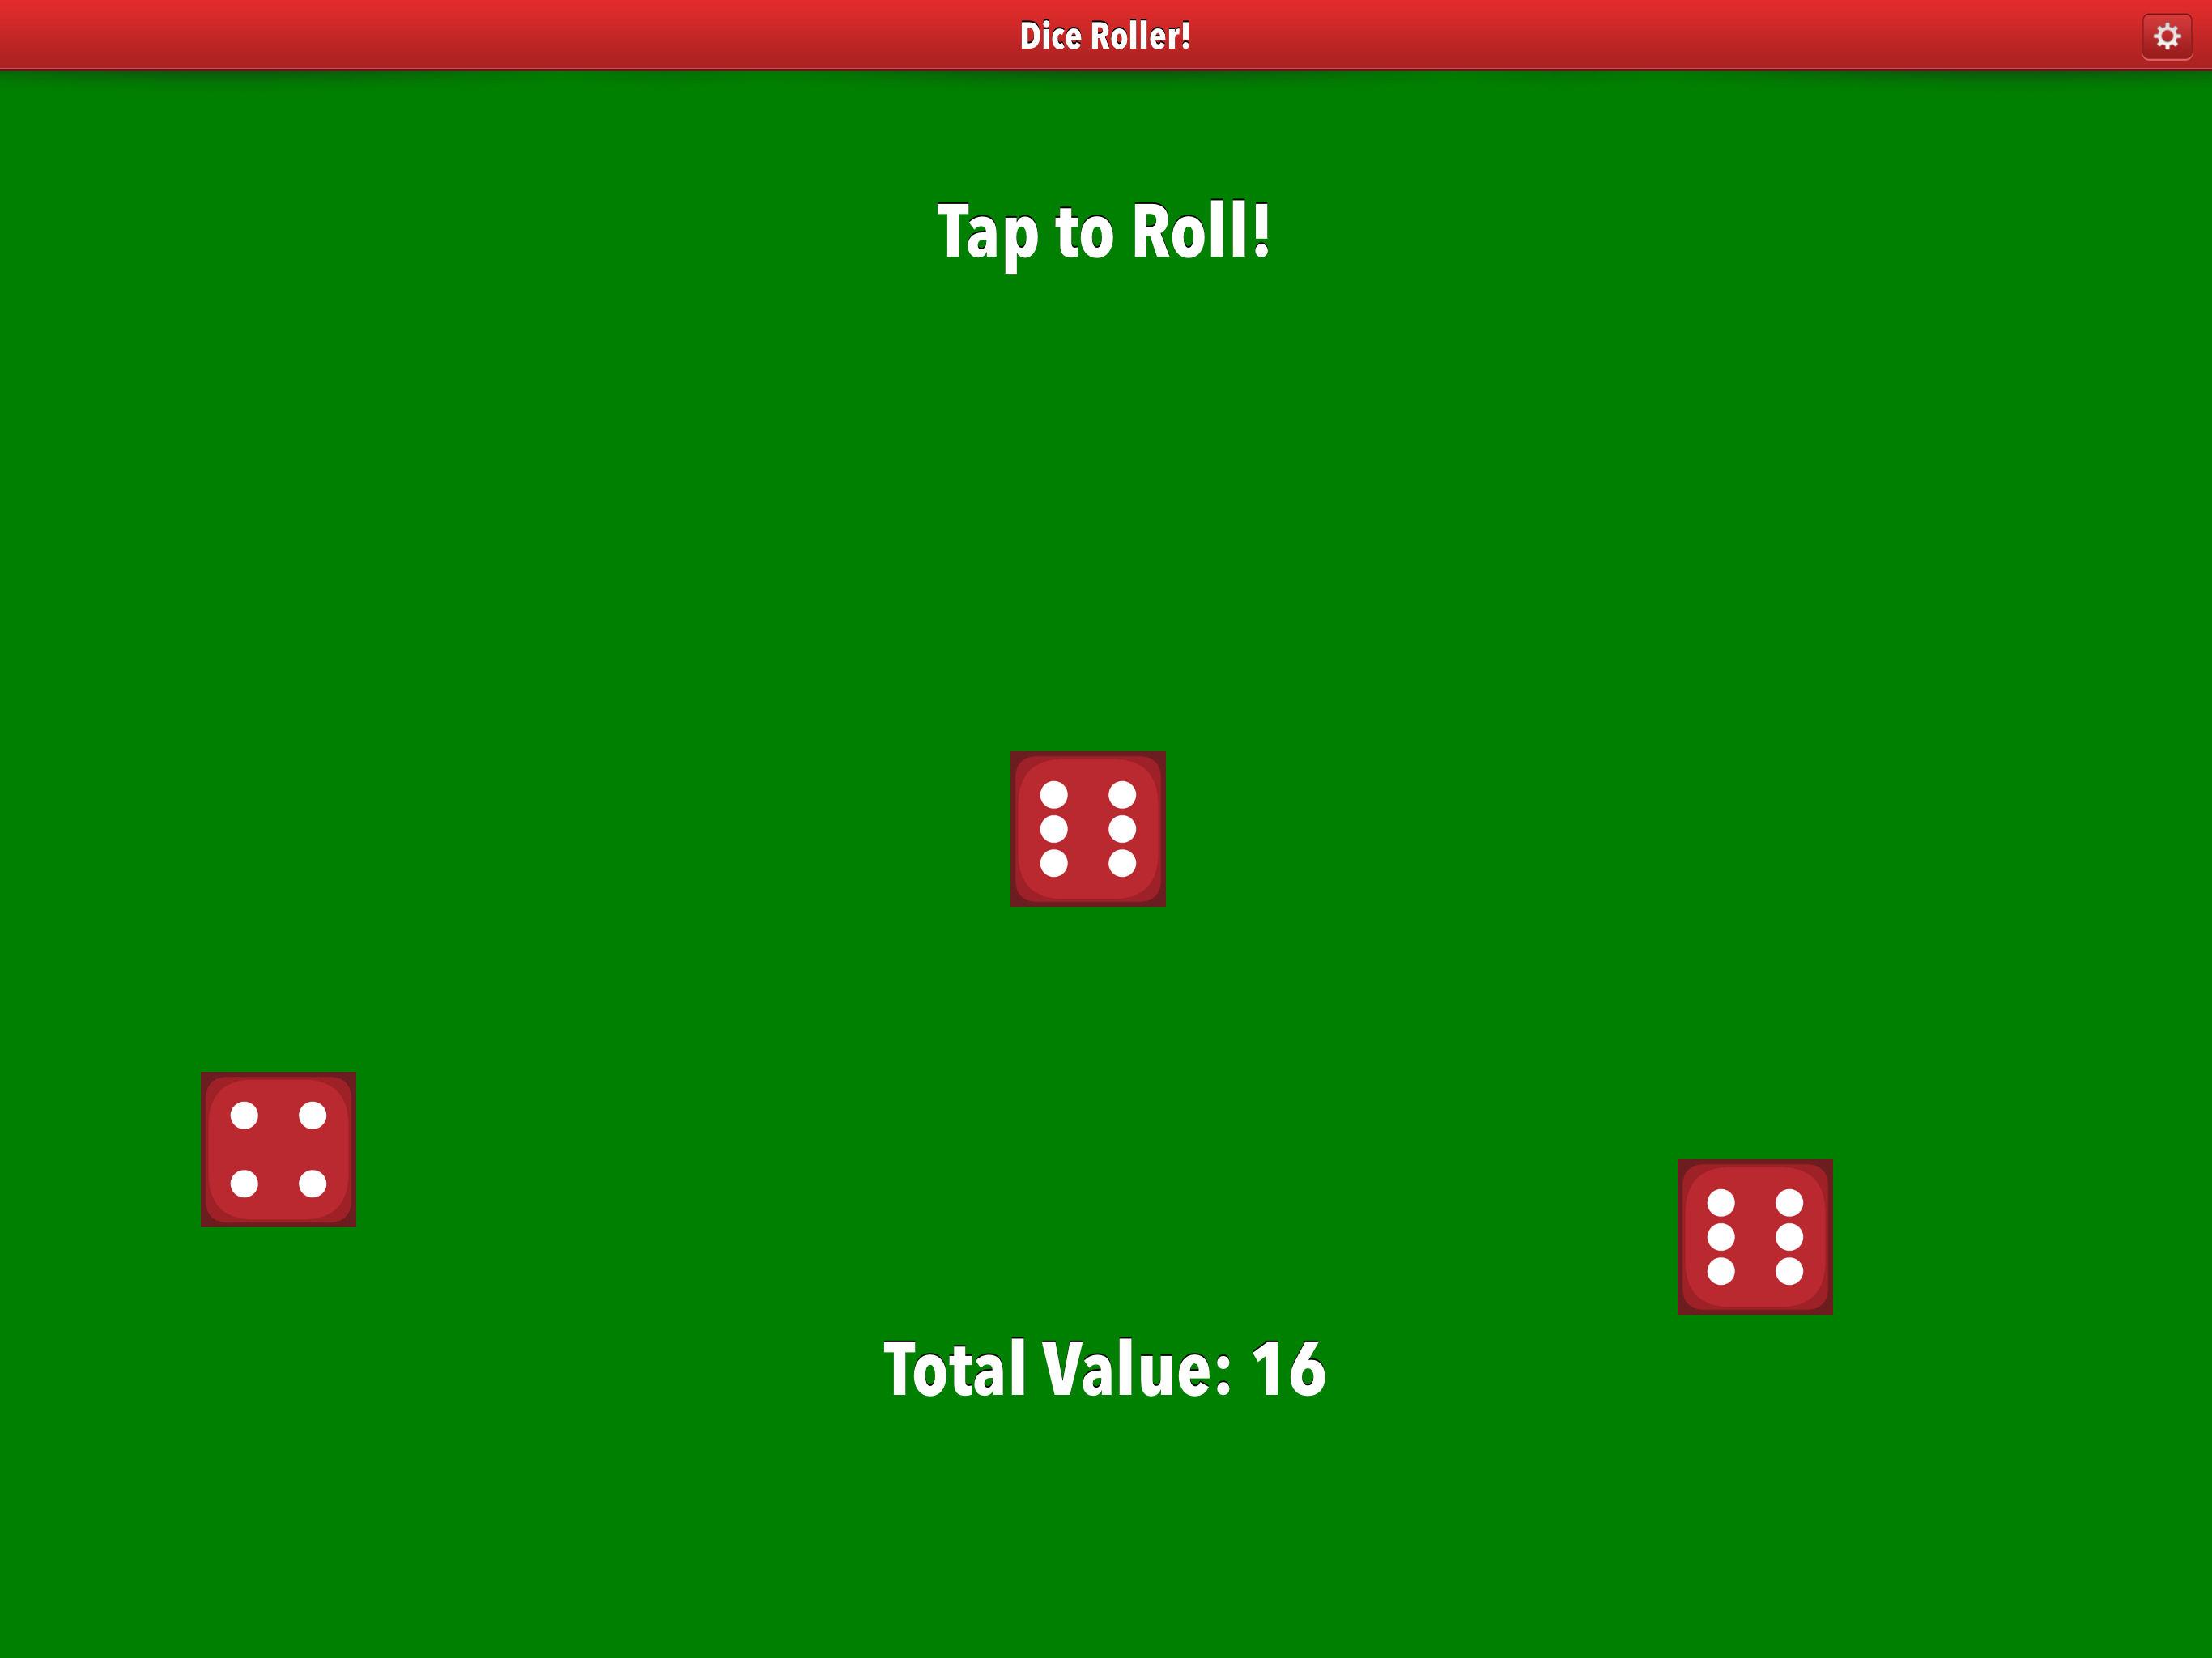 Dice Roller app iPad Pro screenshot three dice.